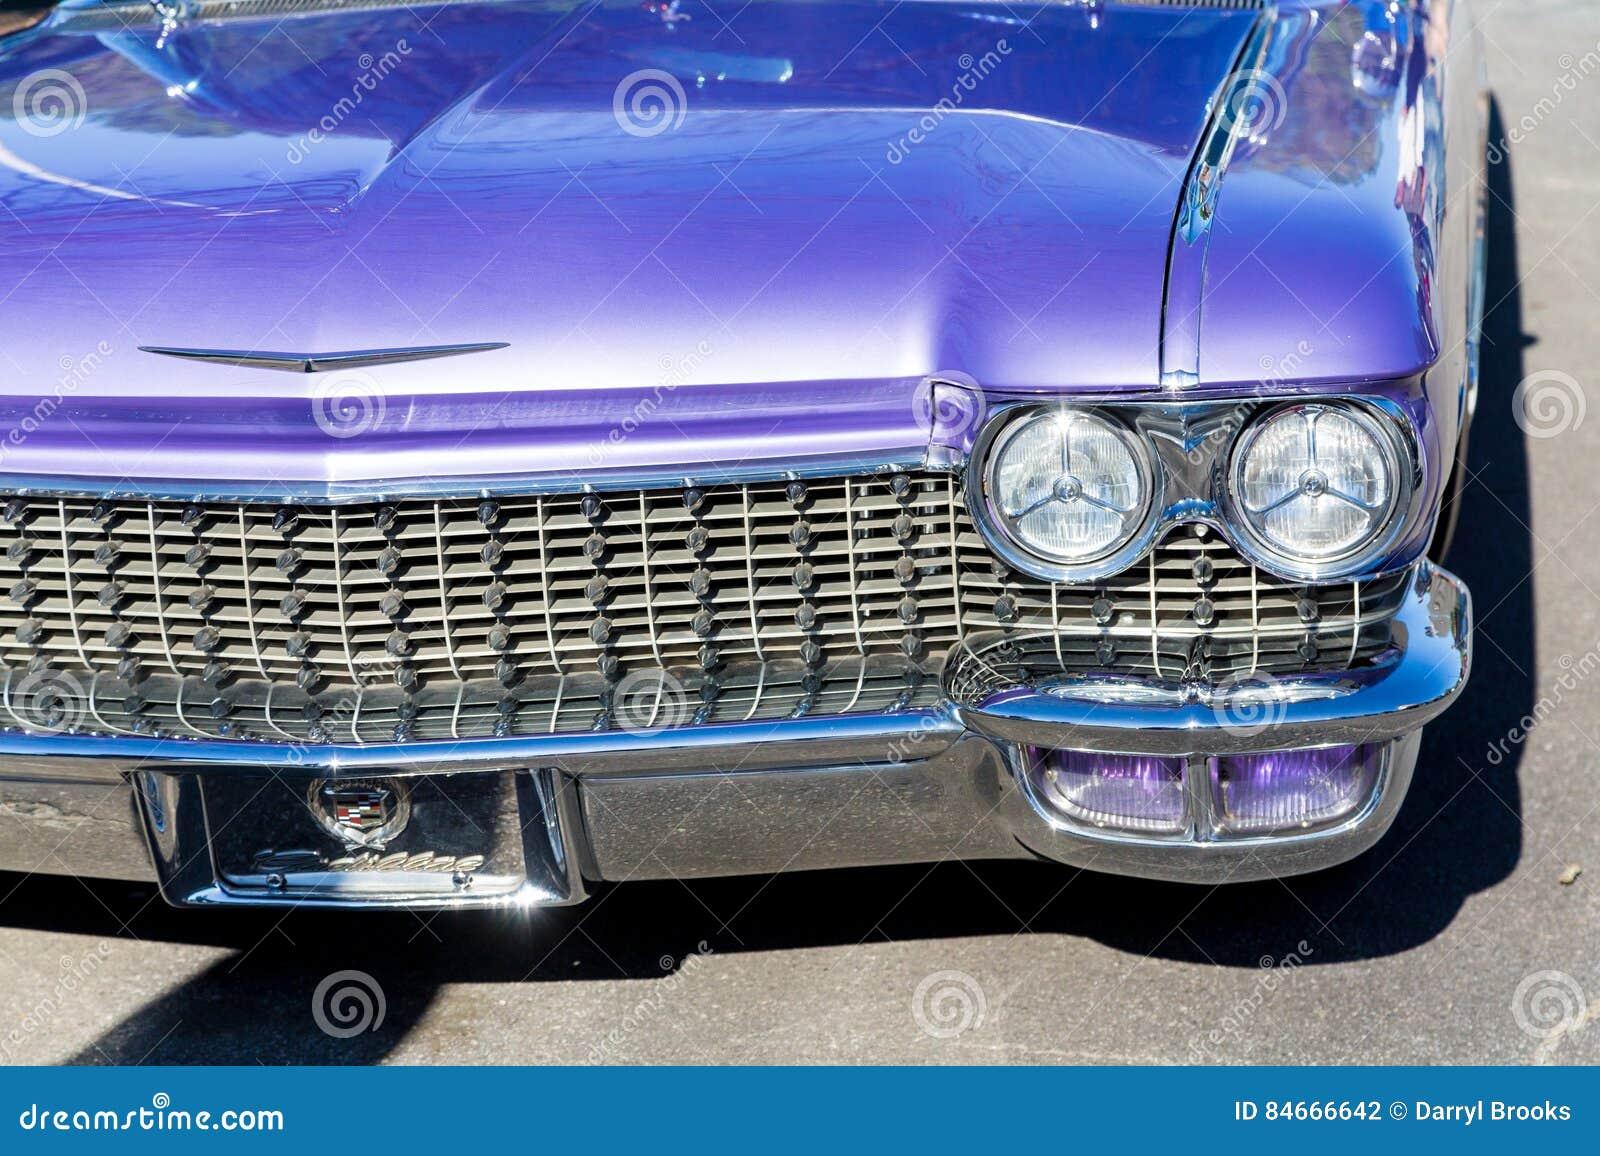 Twin Headlights On Purple Caddy Editorial Photography Image Of - Classic car show atlanta